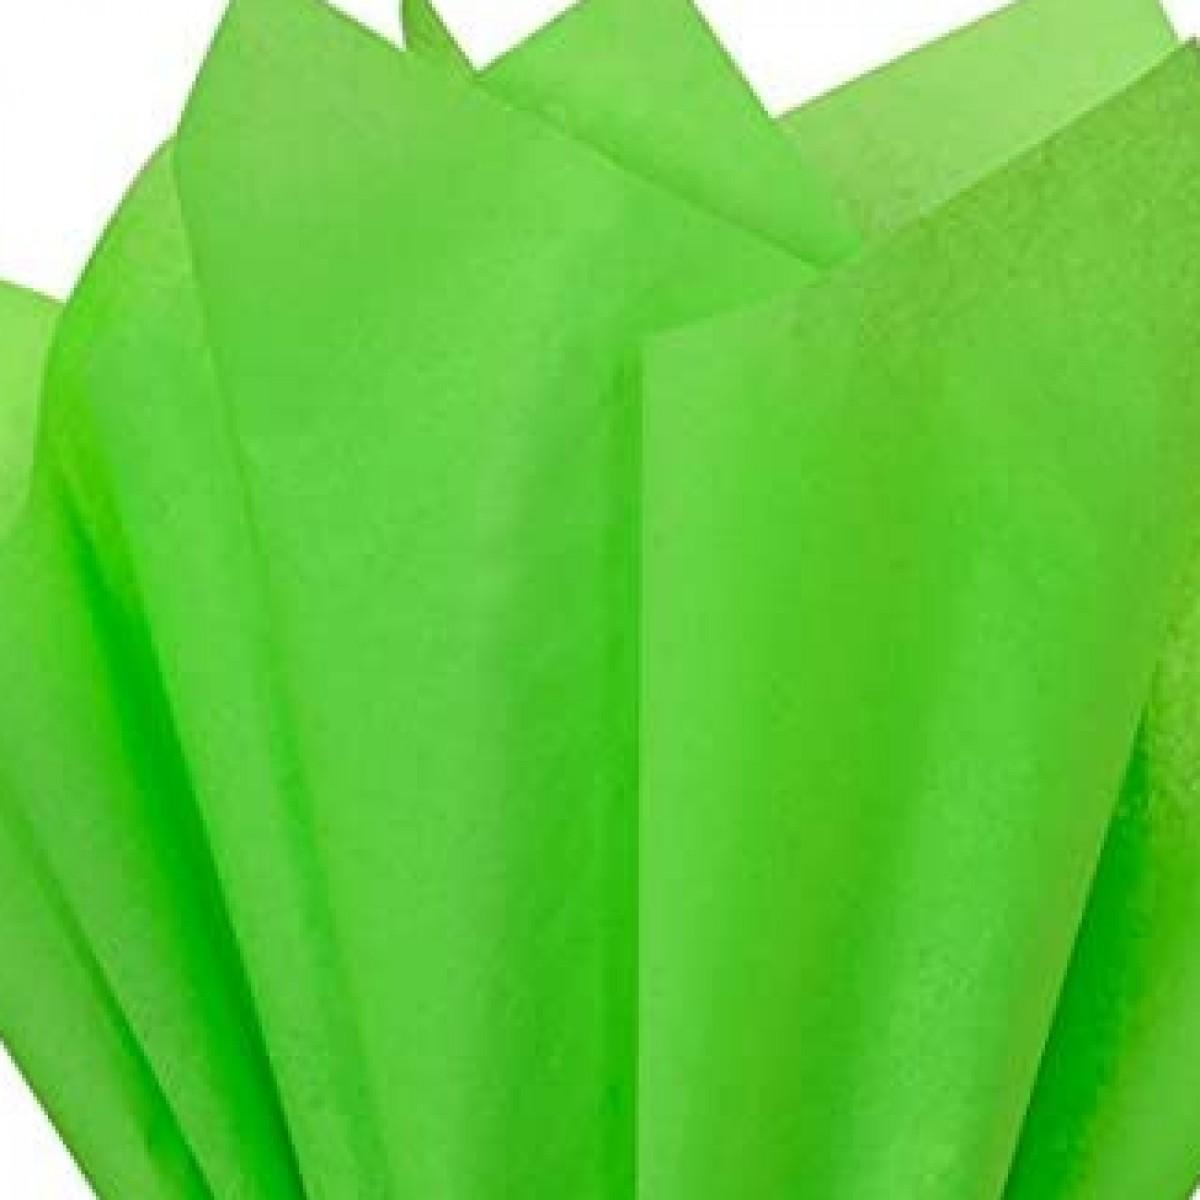 7521 Neon Green 75cmx60cm Tissue Floral Wraps - 100 Sheets